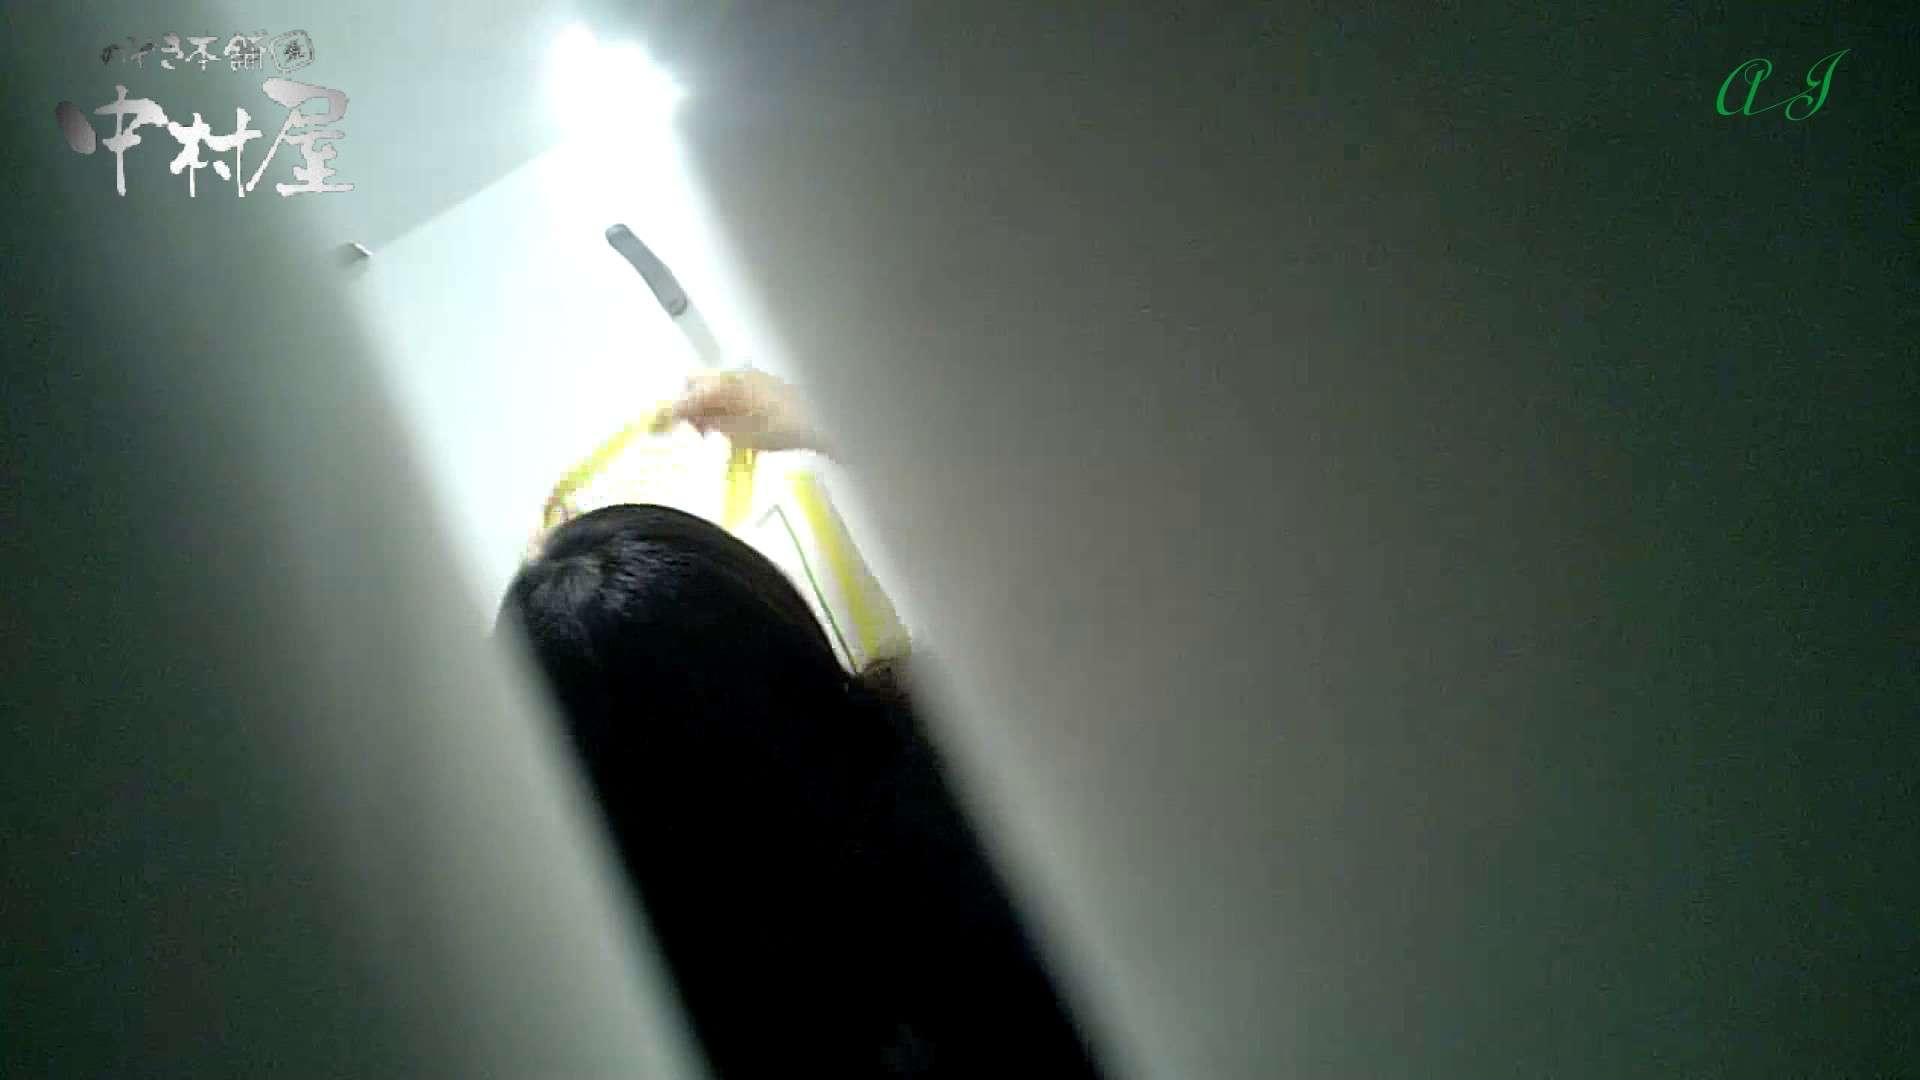 有名大学女性洗面所 vol.62 会話が弾む化粧室!! OLエロ画像  99PICs 50